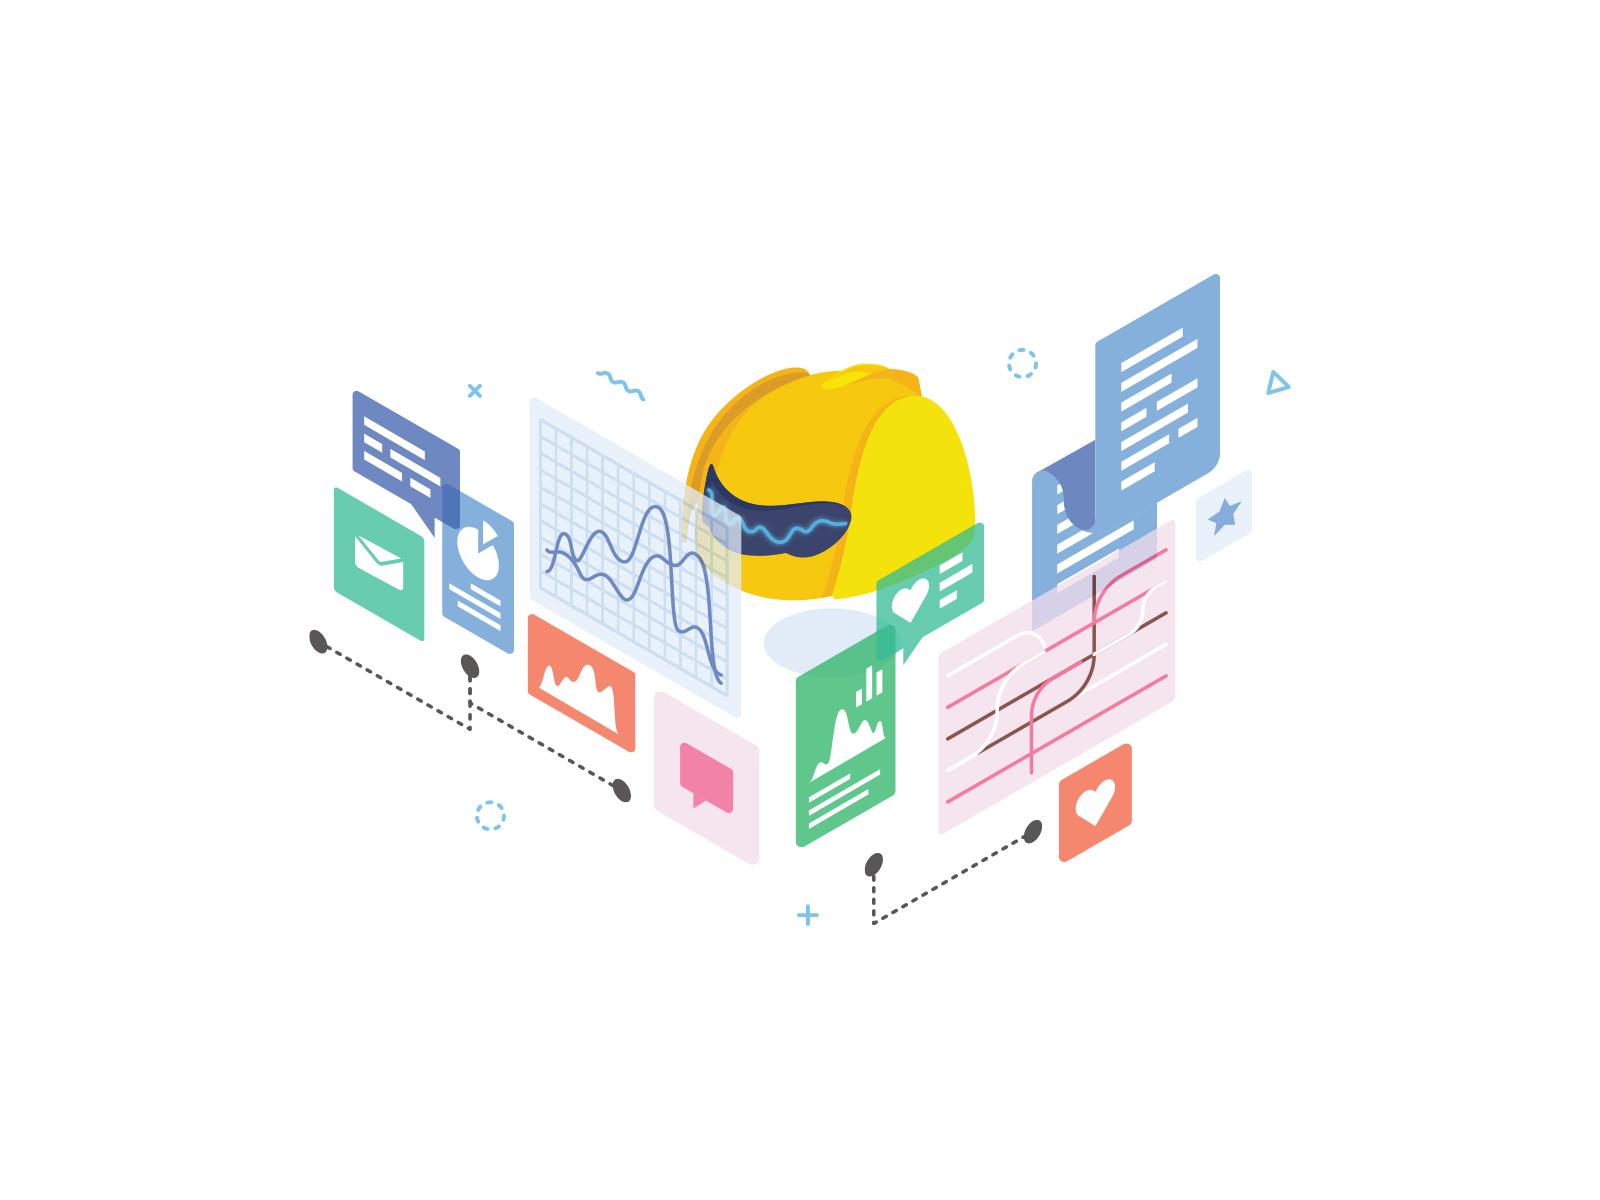 Machinelearning illustration